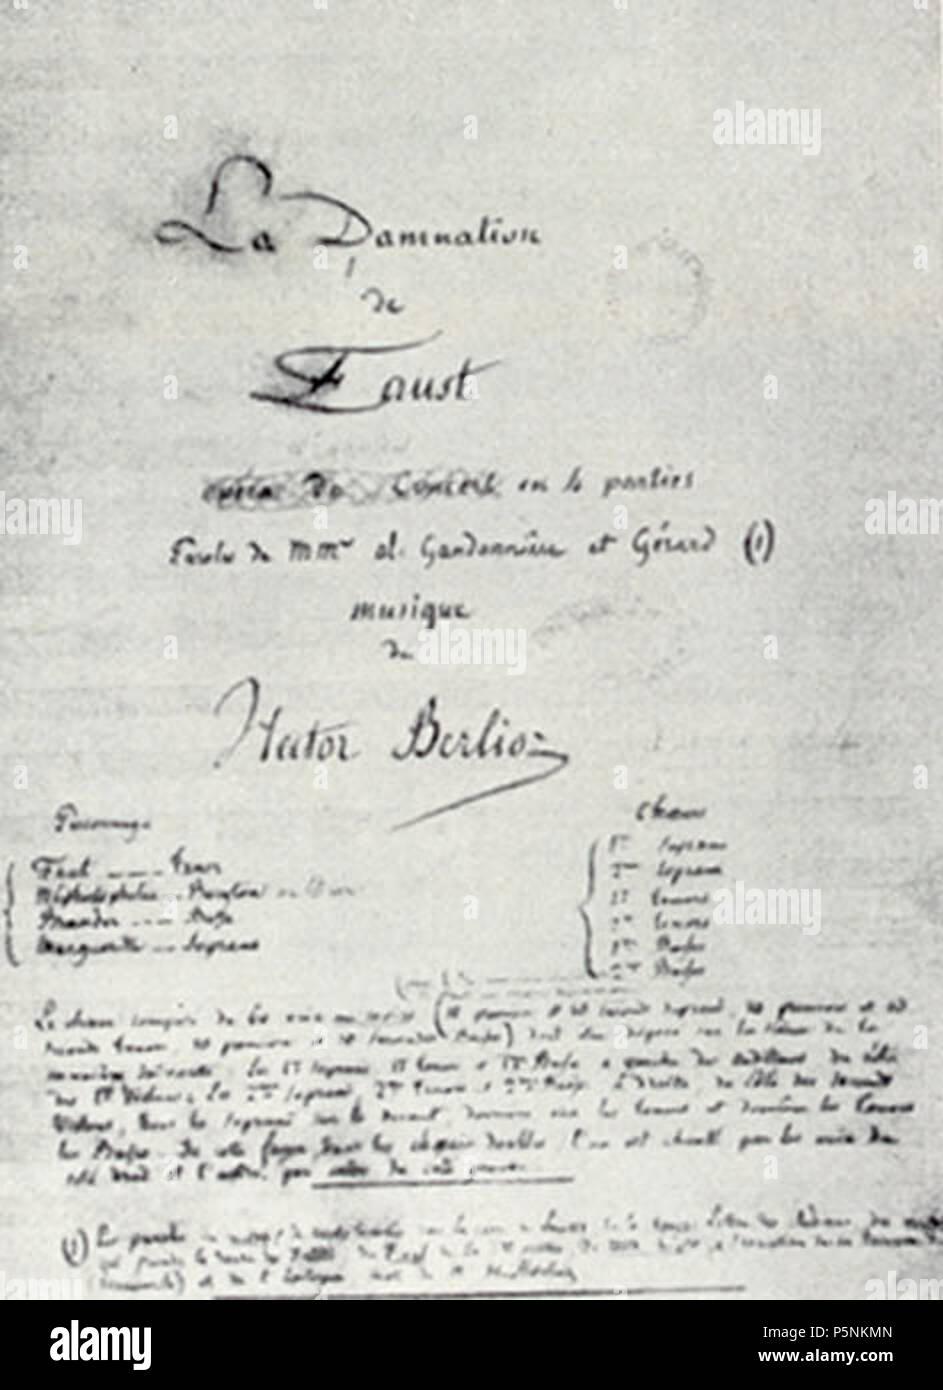 La Damnation De Faust Berlioz : damnation, faust, berlioz, First, Original, Manuscript, Damnation, Faust, French, Composer, Hector, Berlioz, 1846., (1803–1869), Alternative, Names, Louis, Description, Composer,, Journalist,